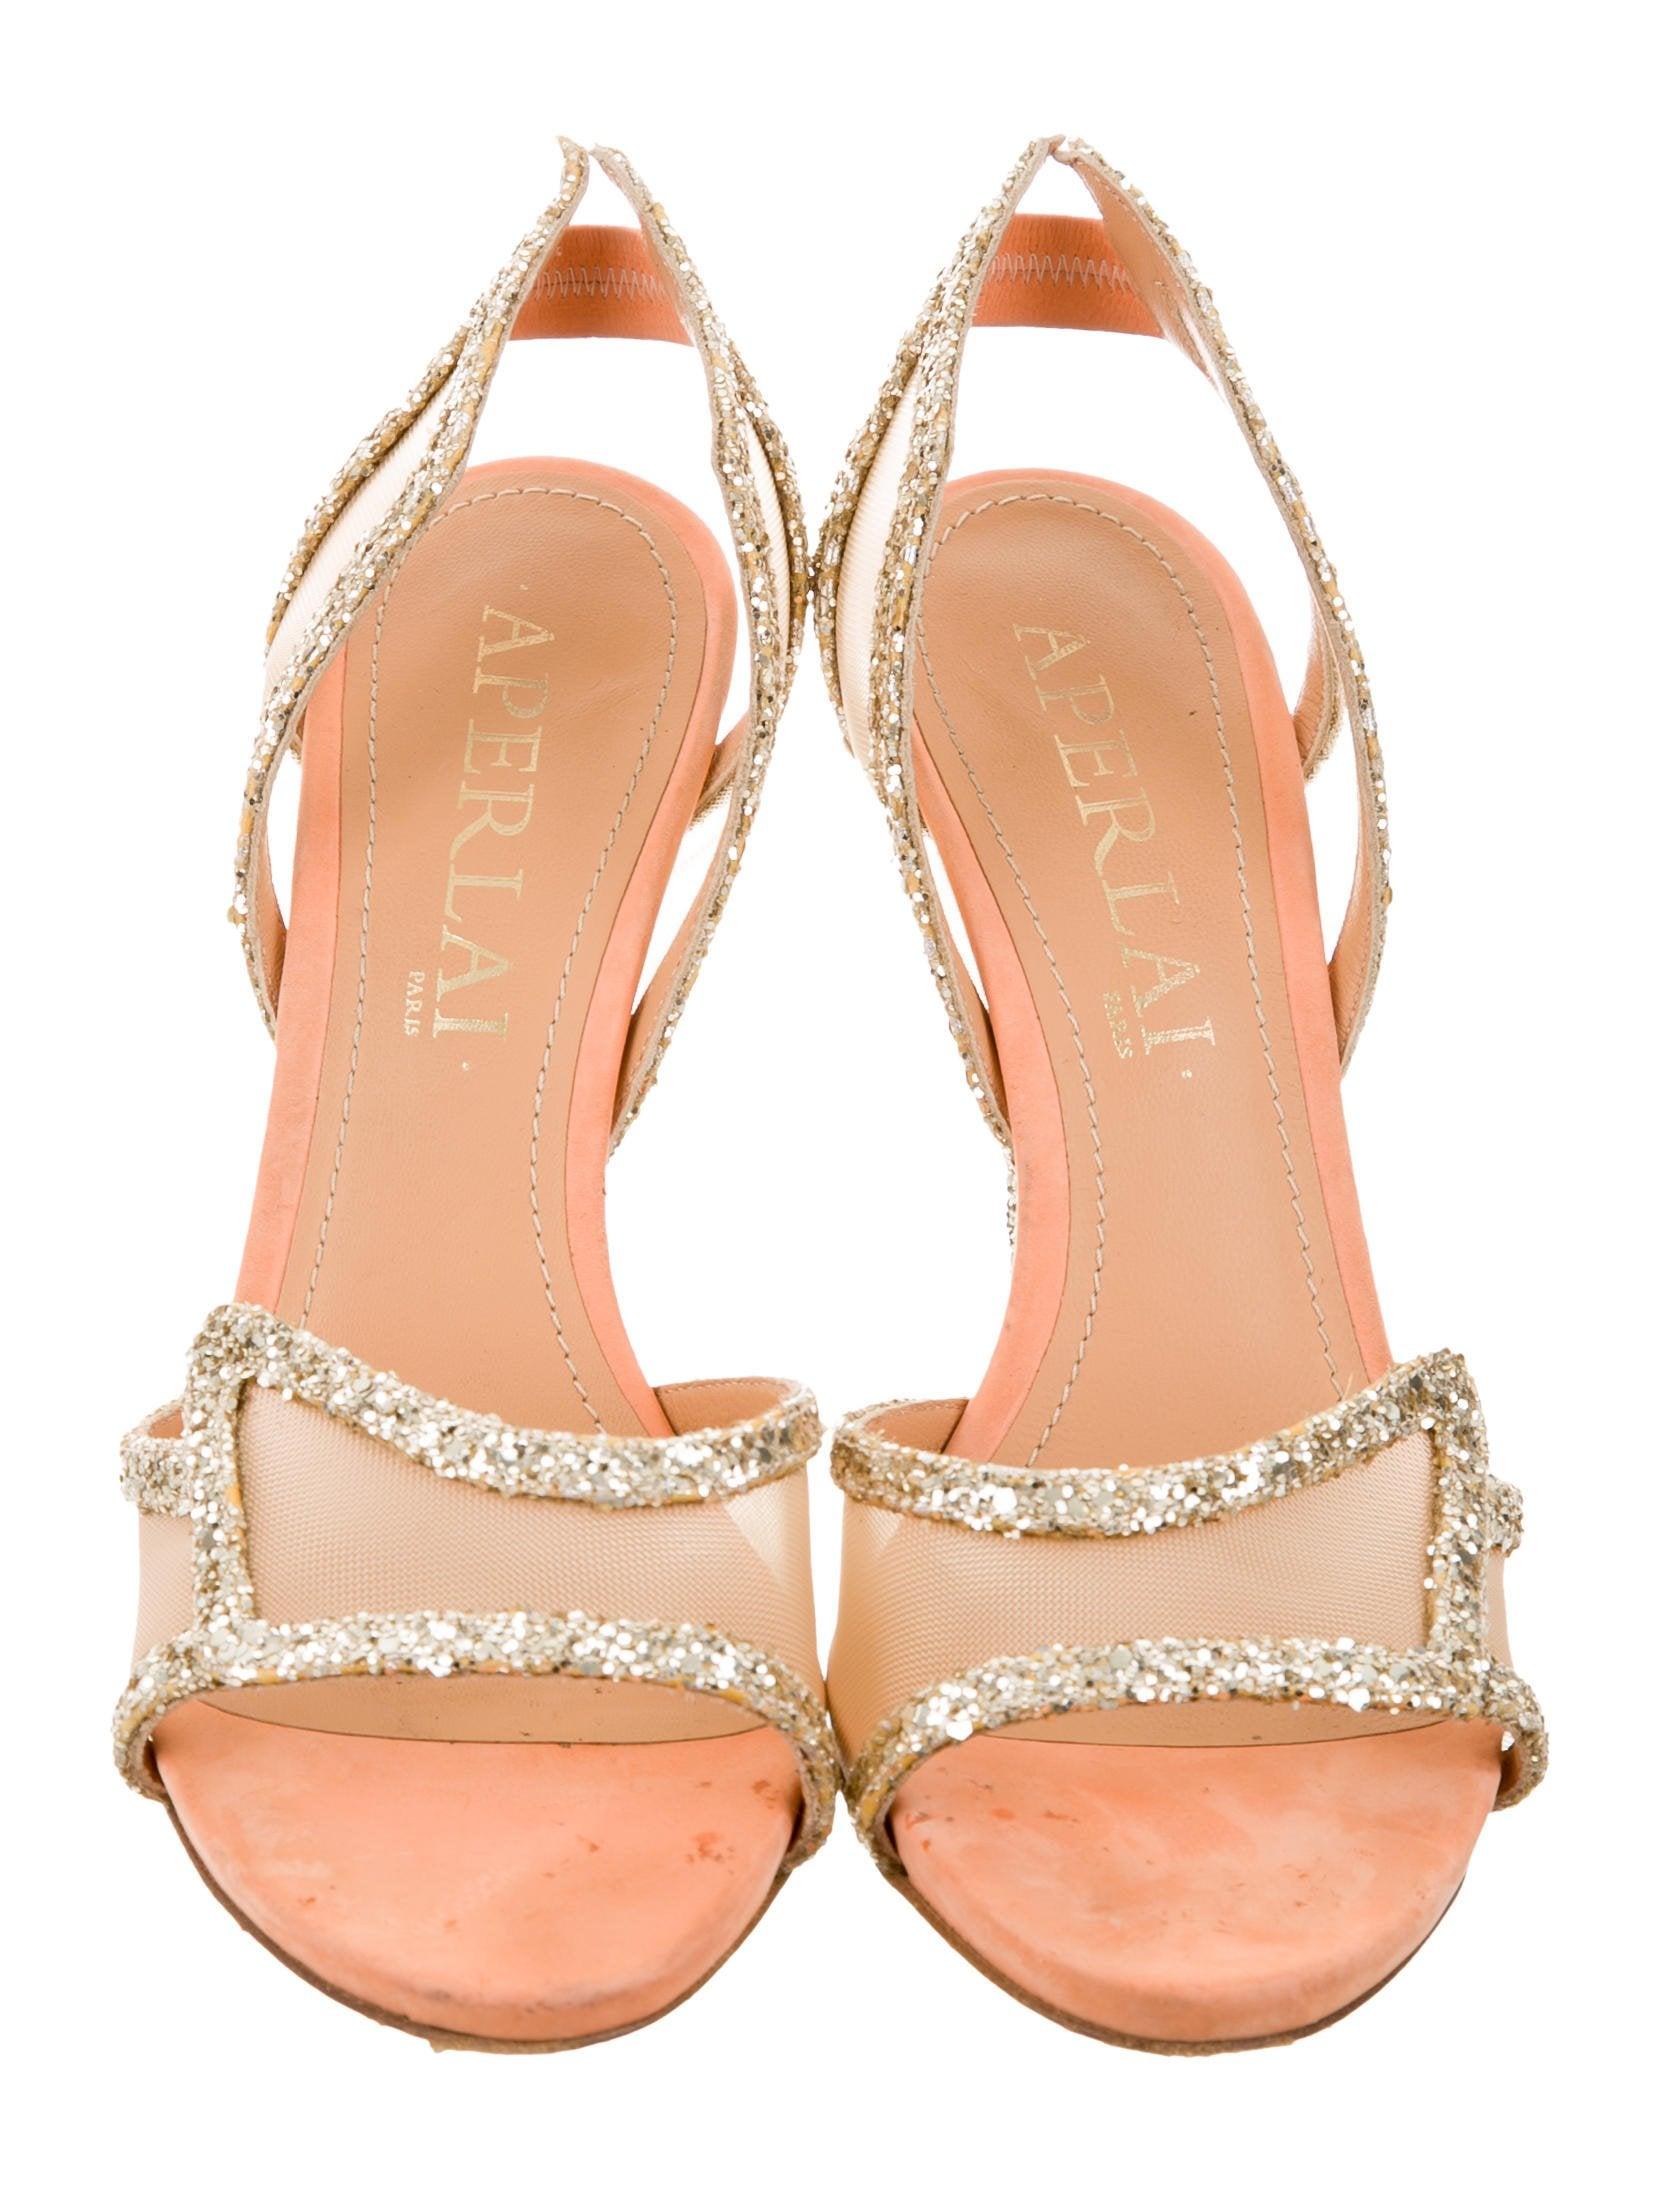 Aperlai Glitter Multistrap Sandals 100% original sale pictures YVp4bDlY0g